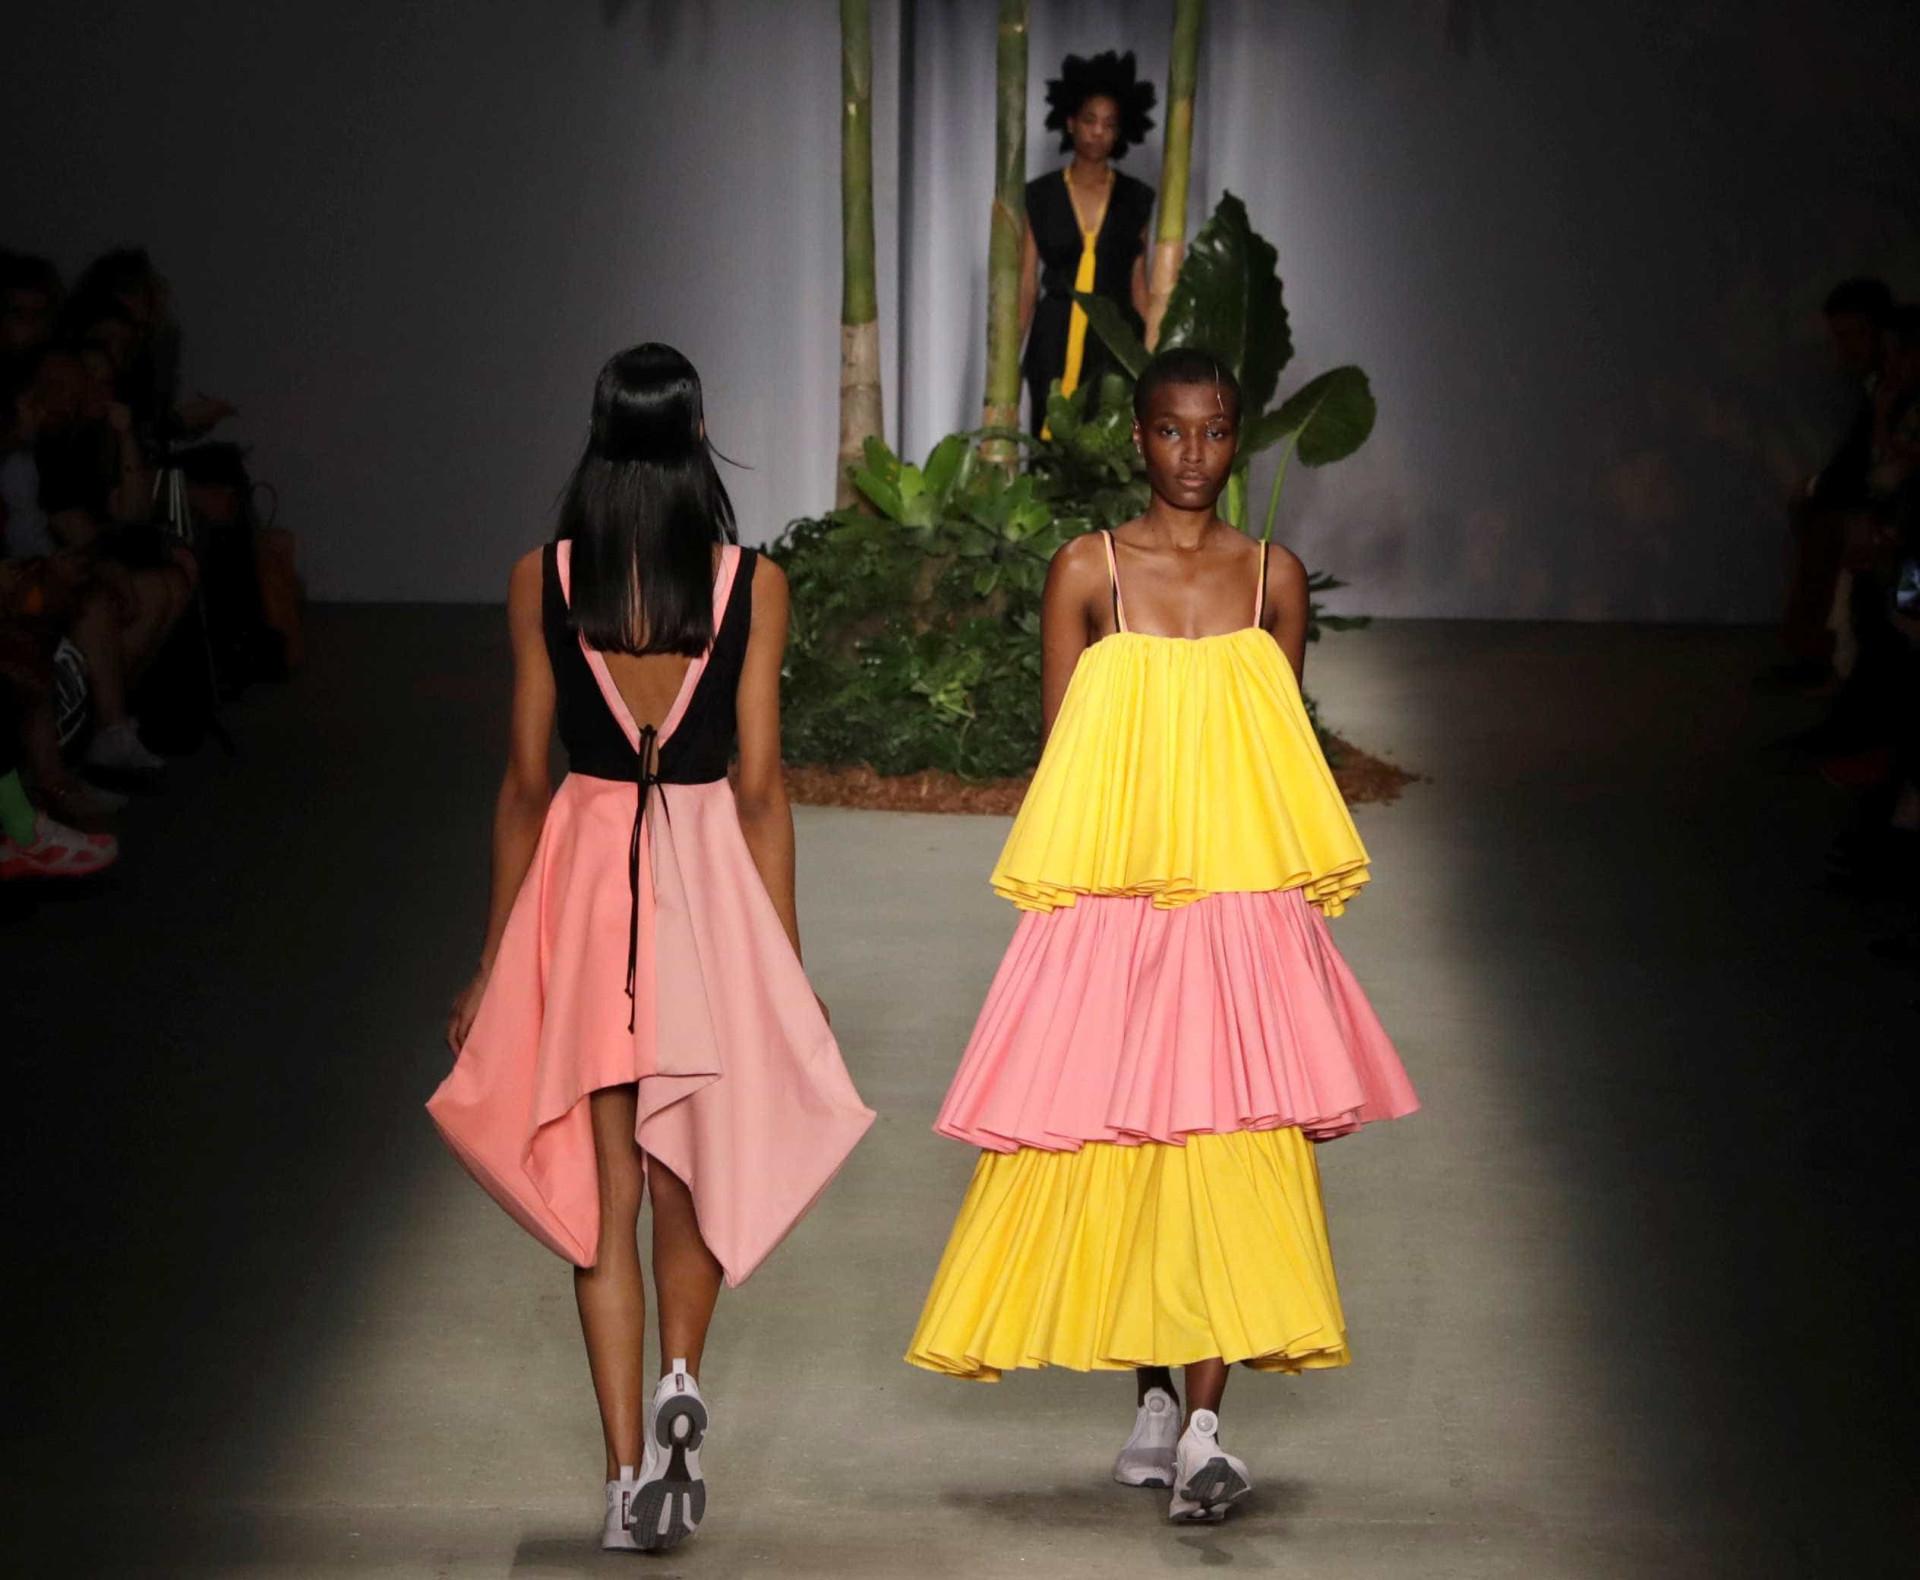 De neon a franjas: 10 tendências para 2019 mostradas na SP Fashion Week